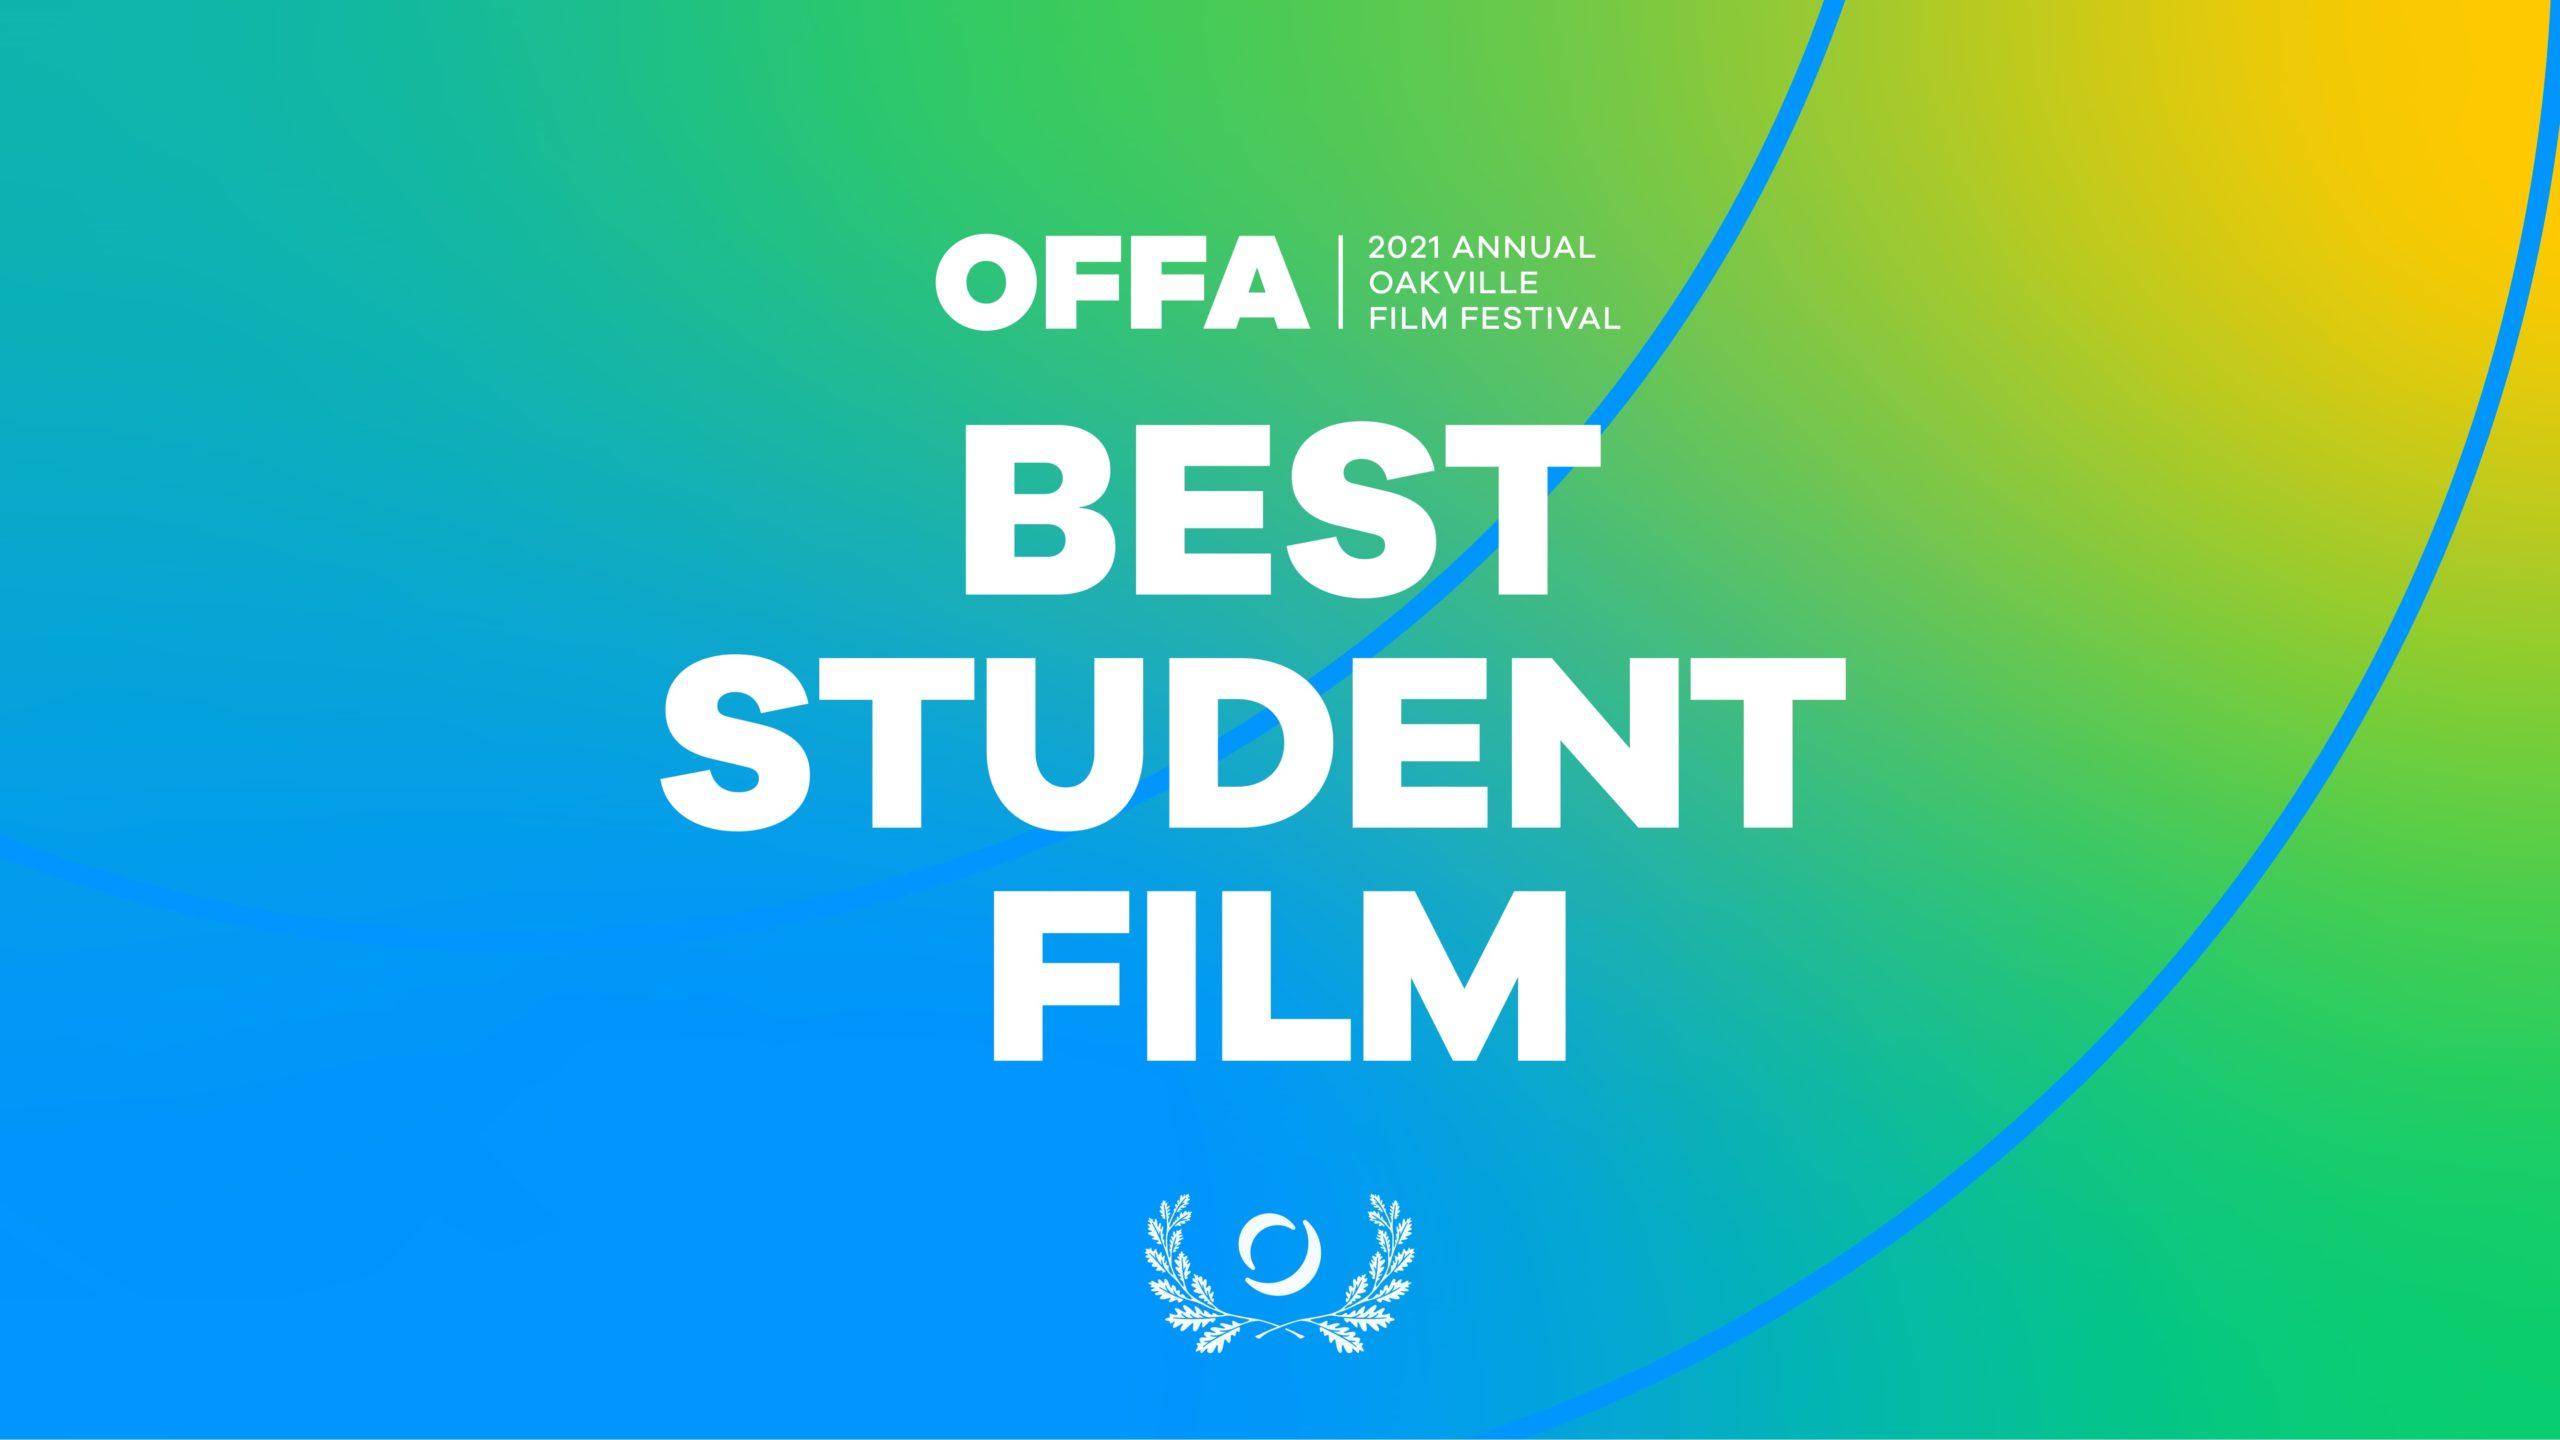 OFFA 2021 Best Student Film